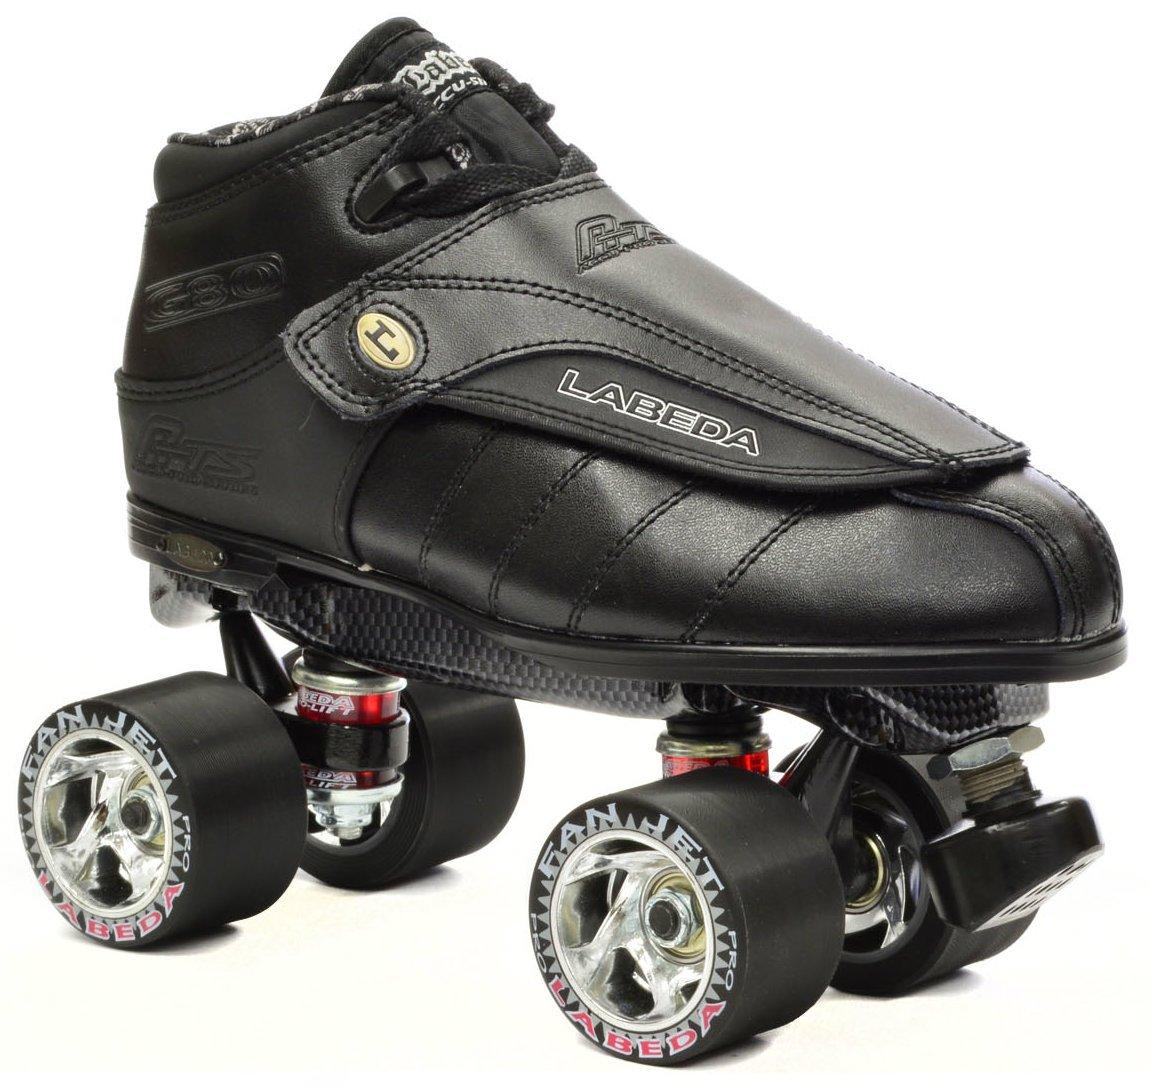 New Black Labeda G80 G-80 Knight Rider Leather Quad Speed Roller Derby Jam Skate (Mens 5 / Ladies 6)